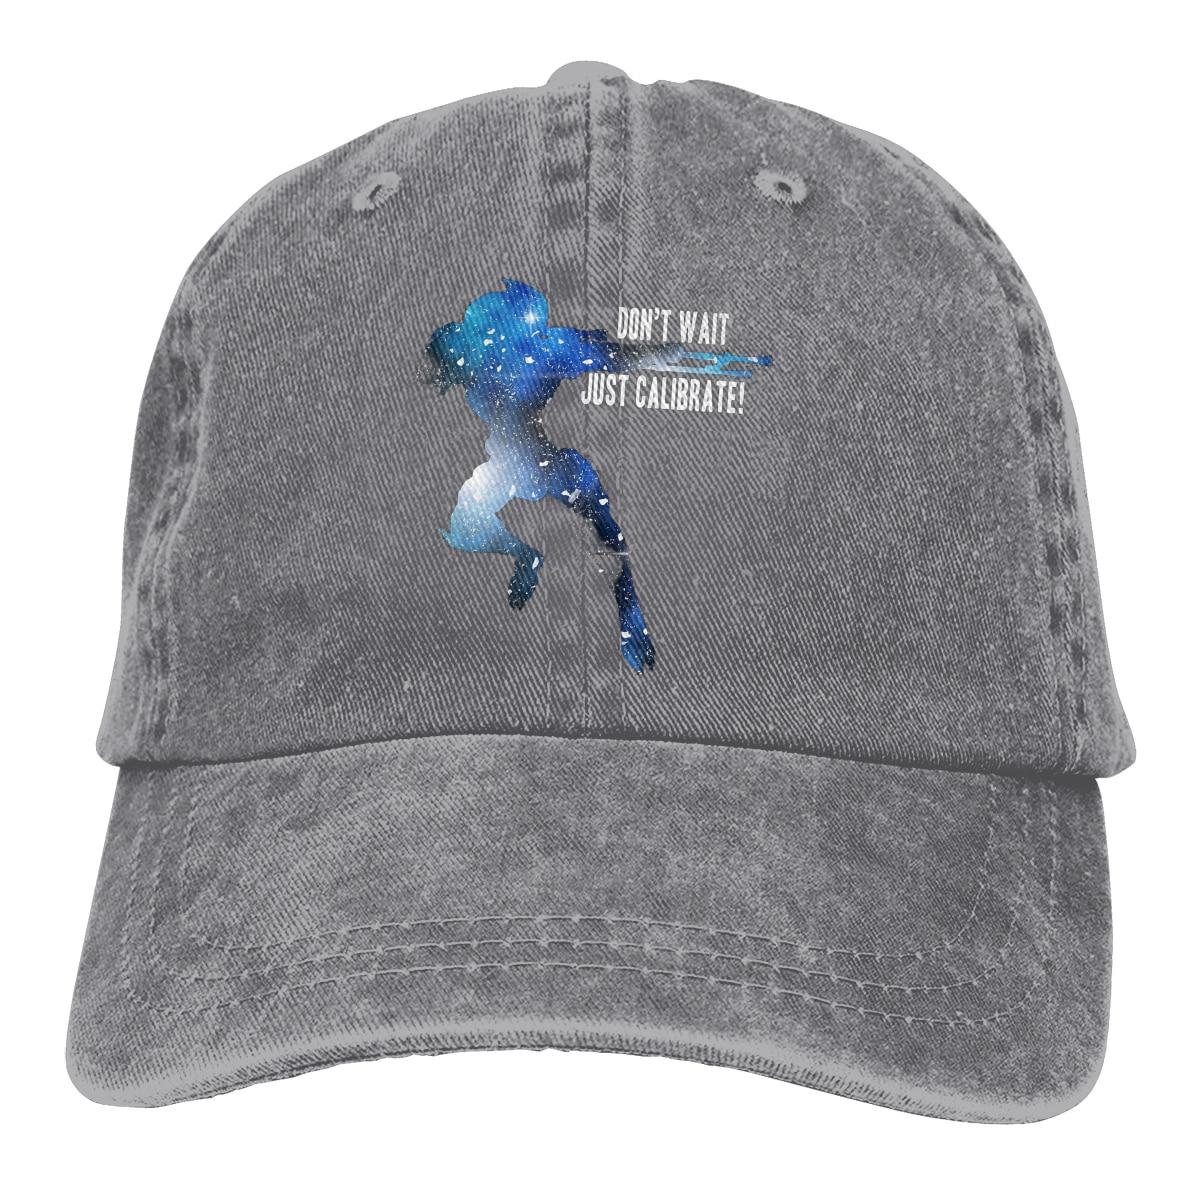 Siluetas Garrus no espere sólo calibrar gorra de béisbol hombres gorras mujeres Snapback Mass Effect Caps